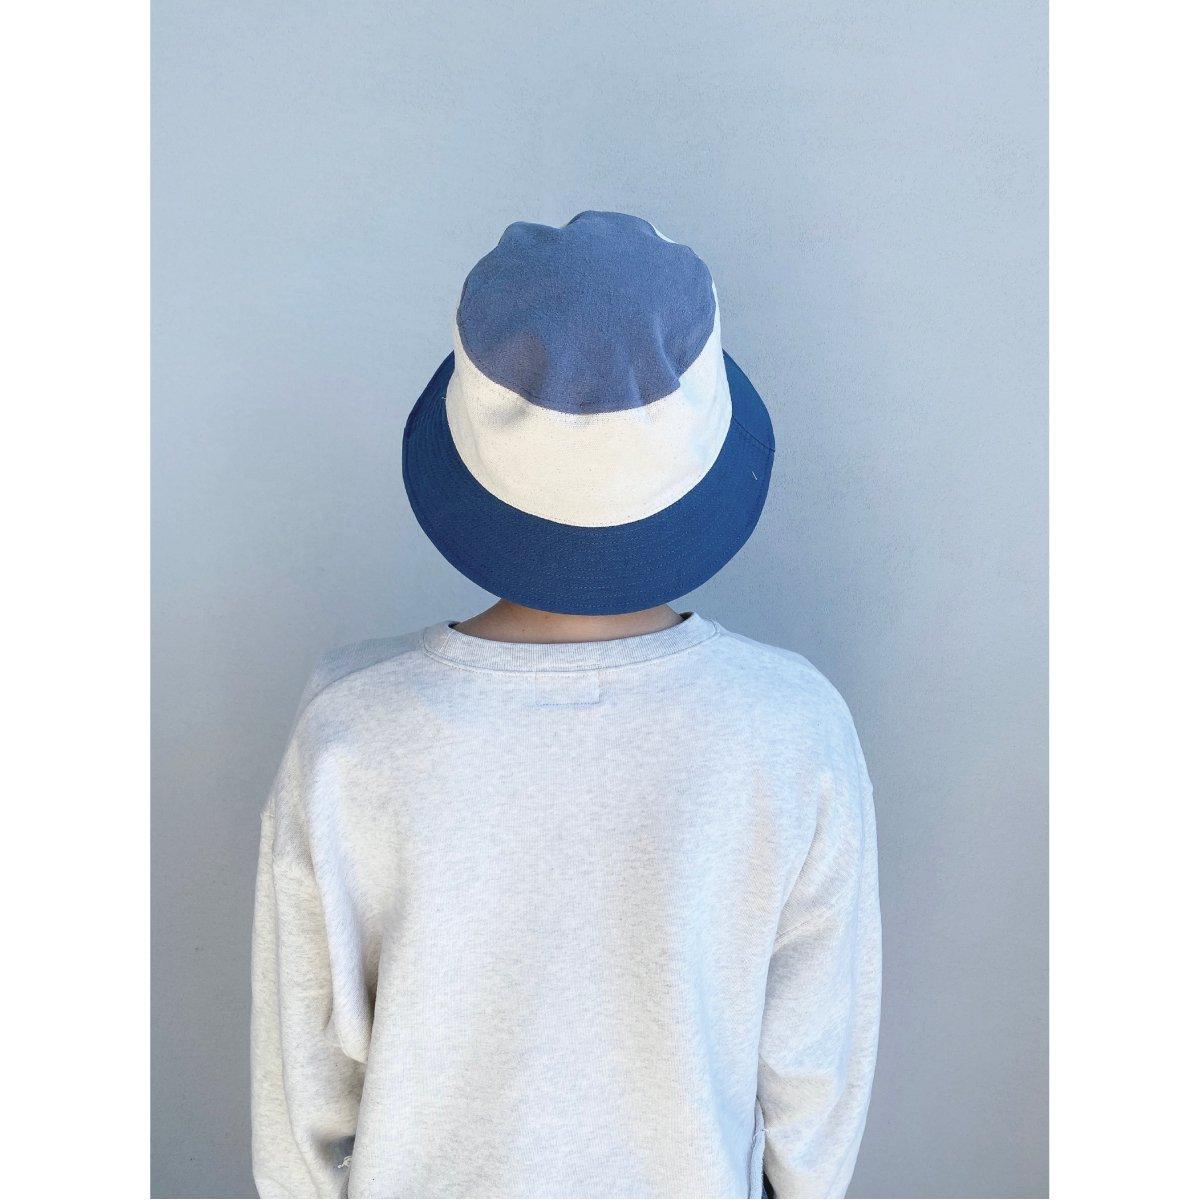 Repro Hat 詳細画像25